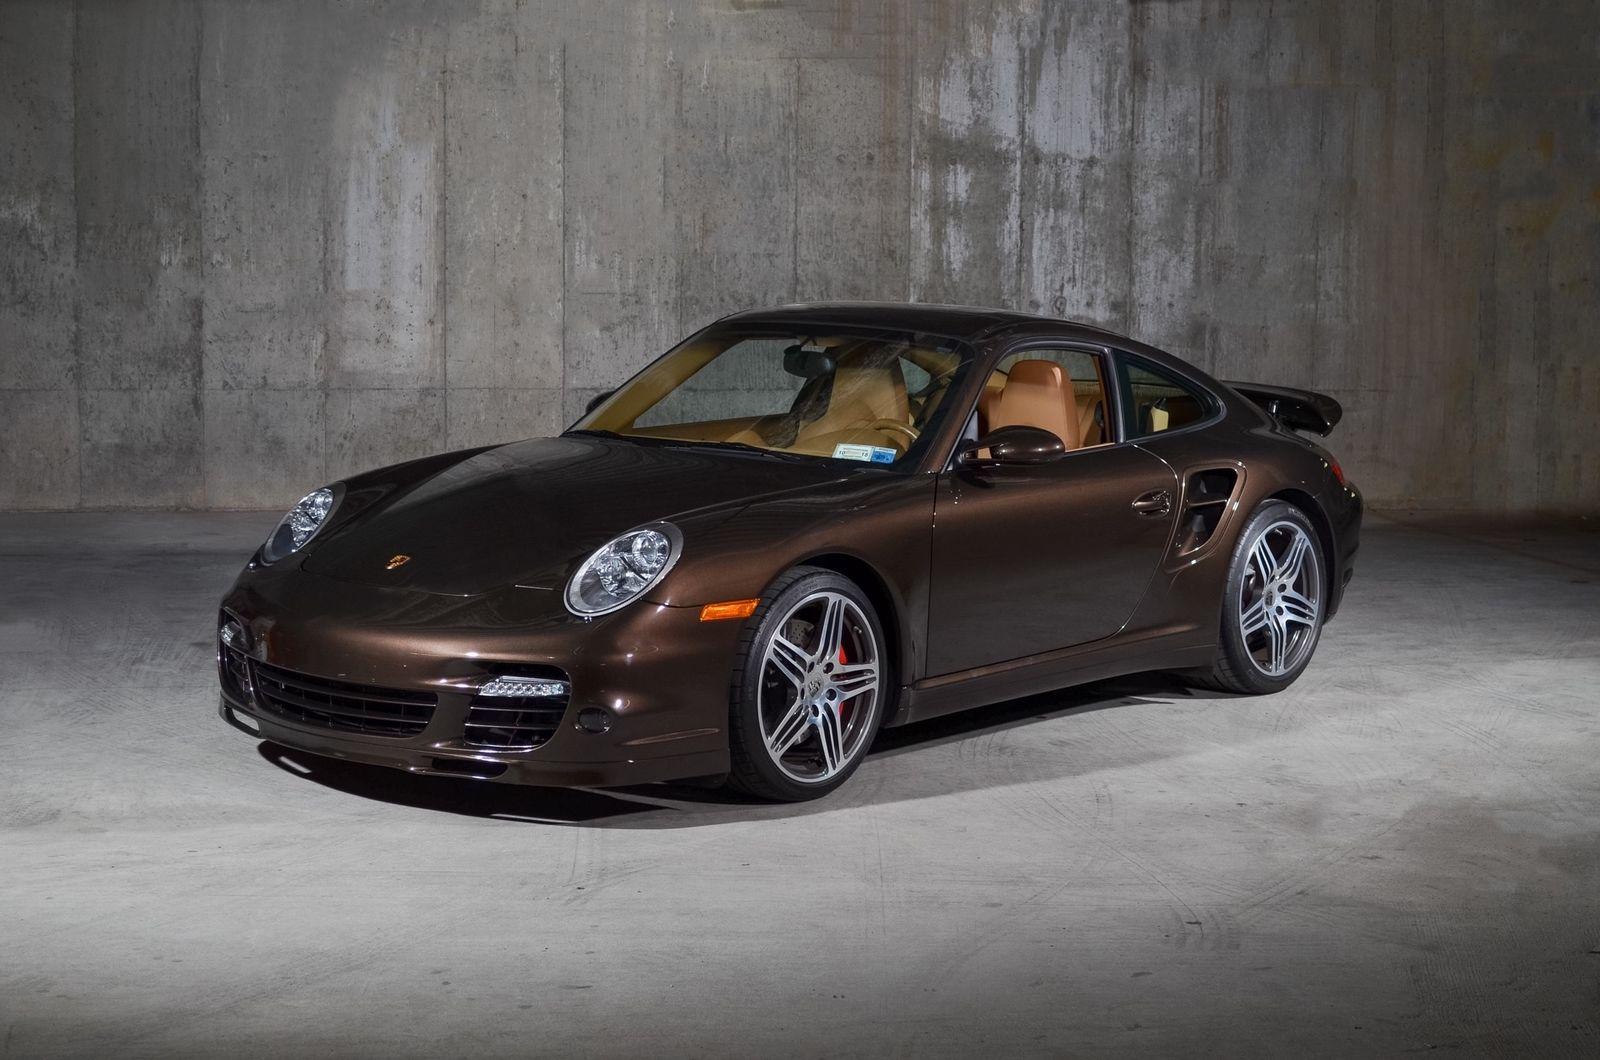 Great 911 Turbo 2008 Porsche 911 Turbo 13205 Miles